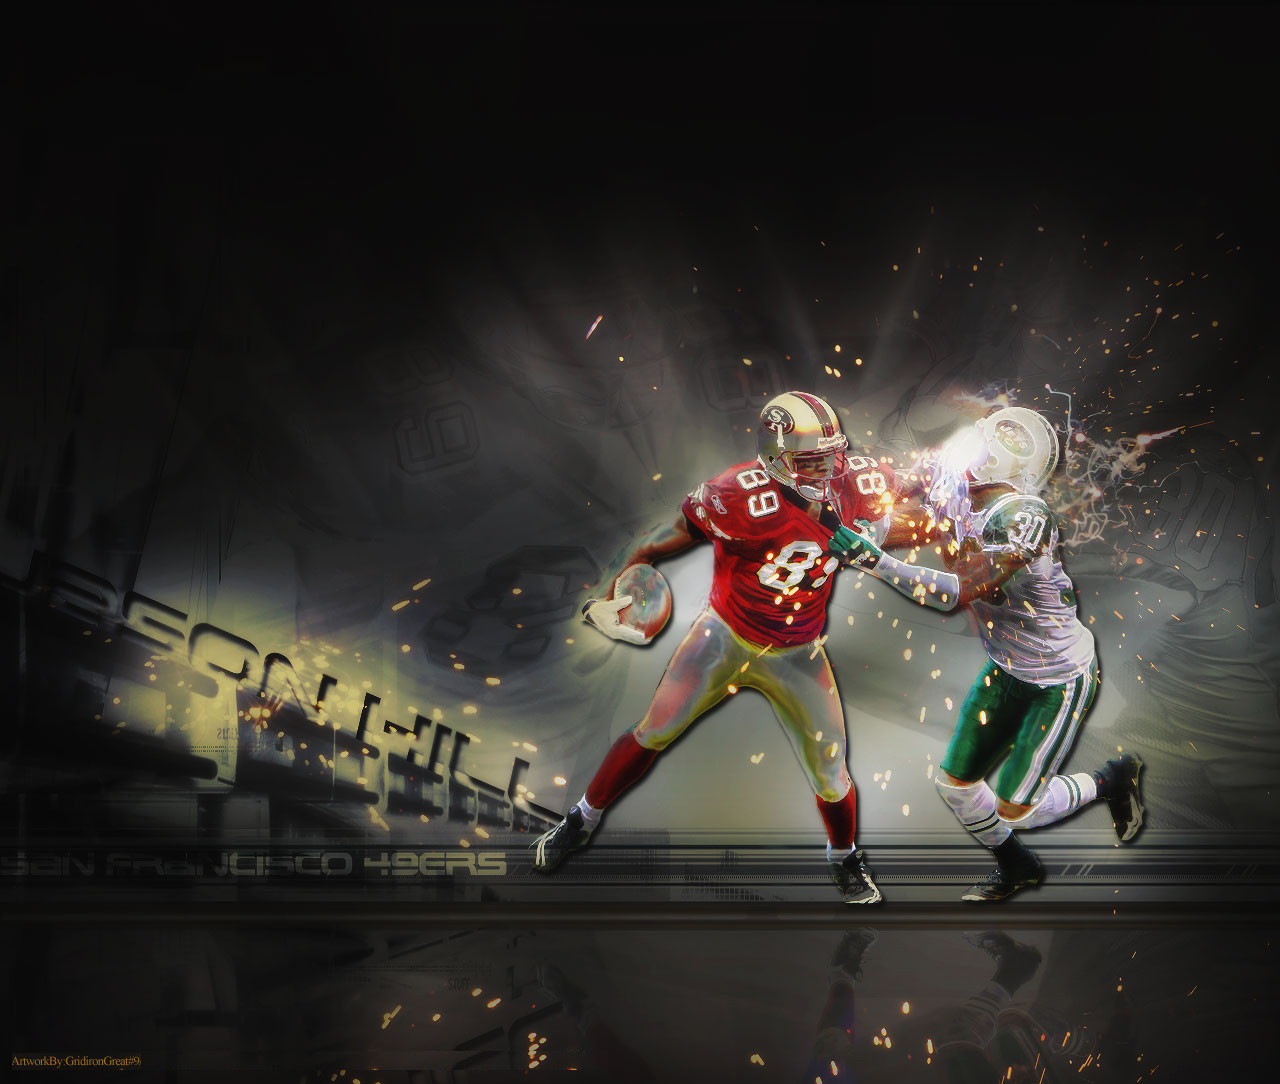 49ers 1080p hd wallpaper